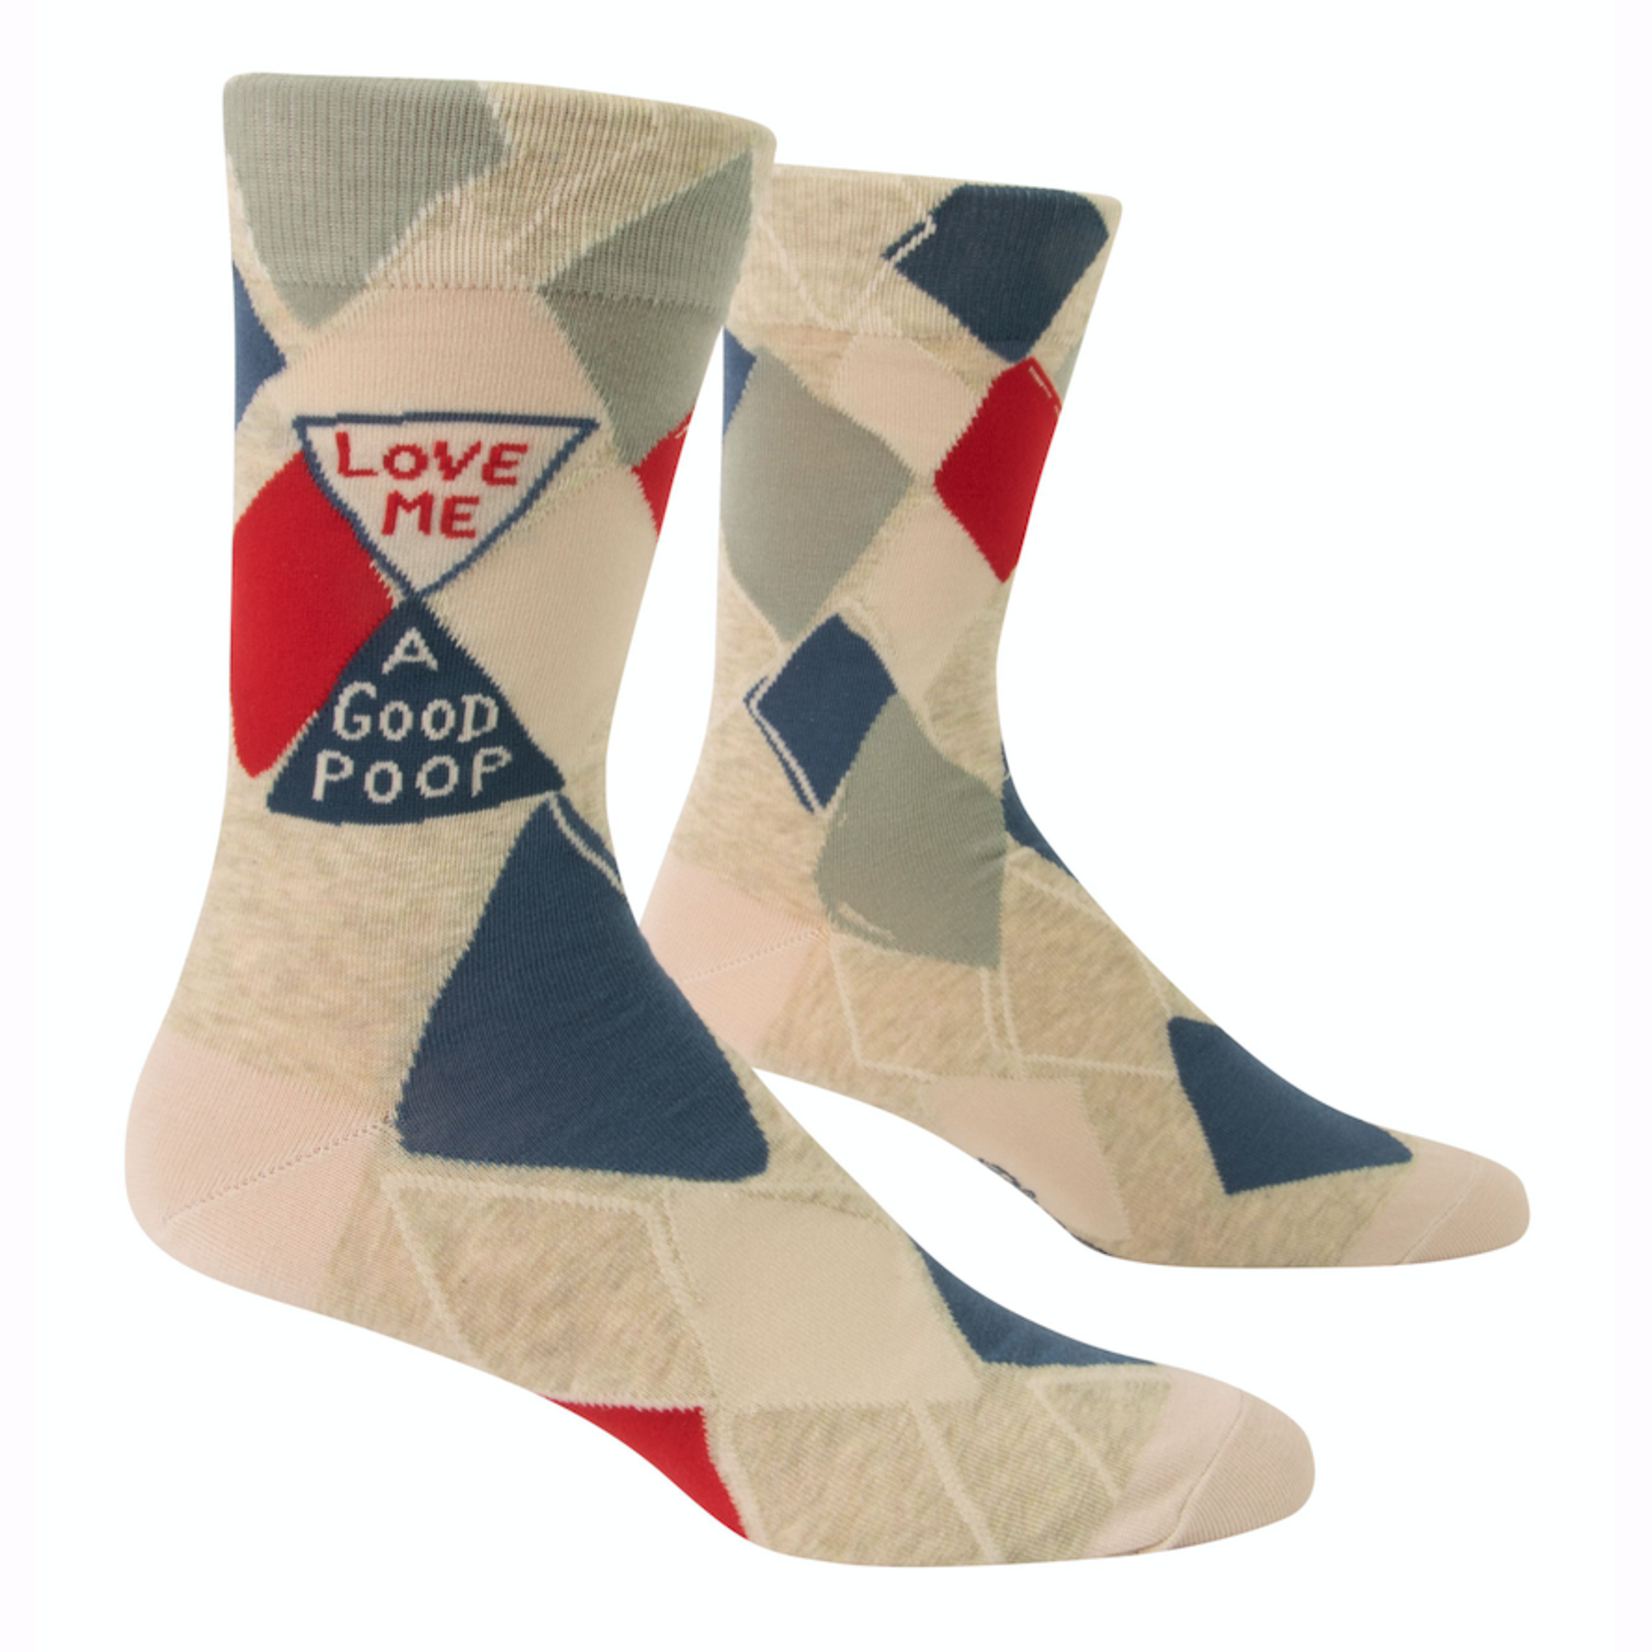 Love Me A Good Poop Men's Crew Socks